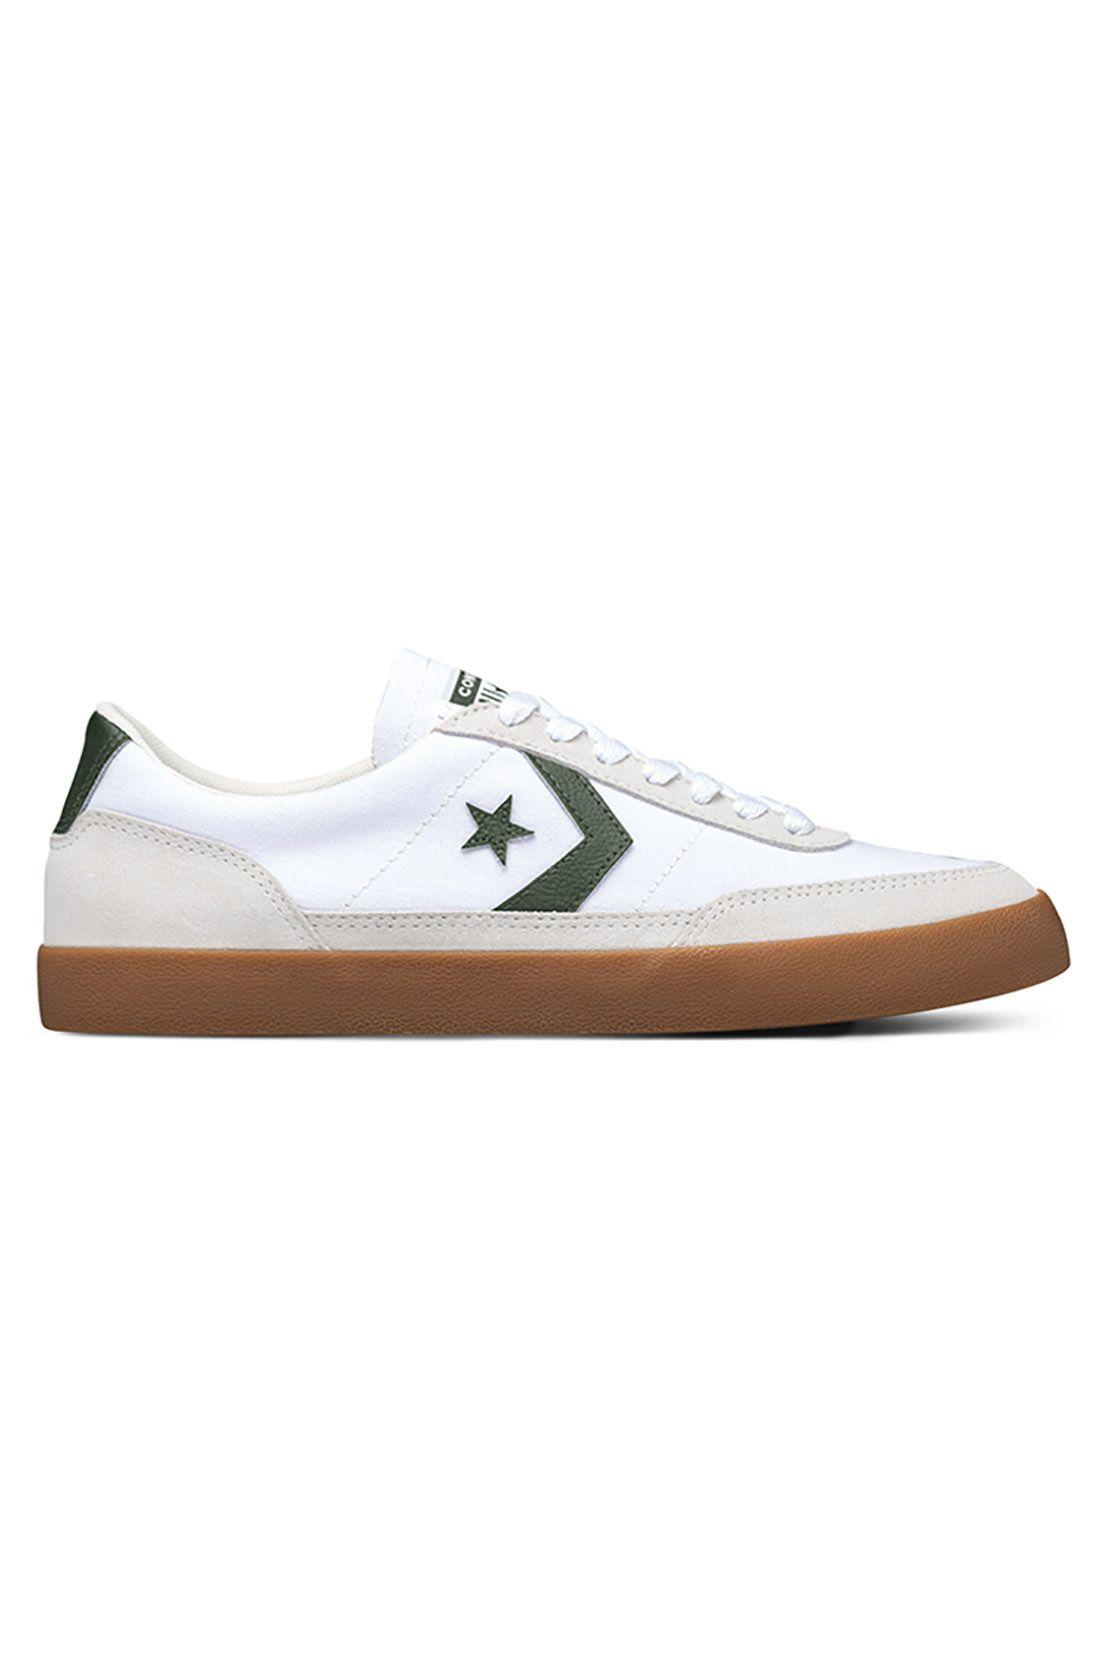 Tenis Converse NET STAR CLASSIC OX White/Vaporous Gray/Dark Moss